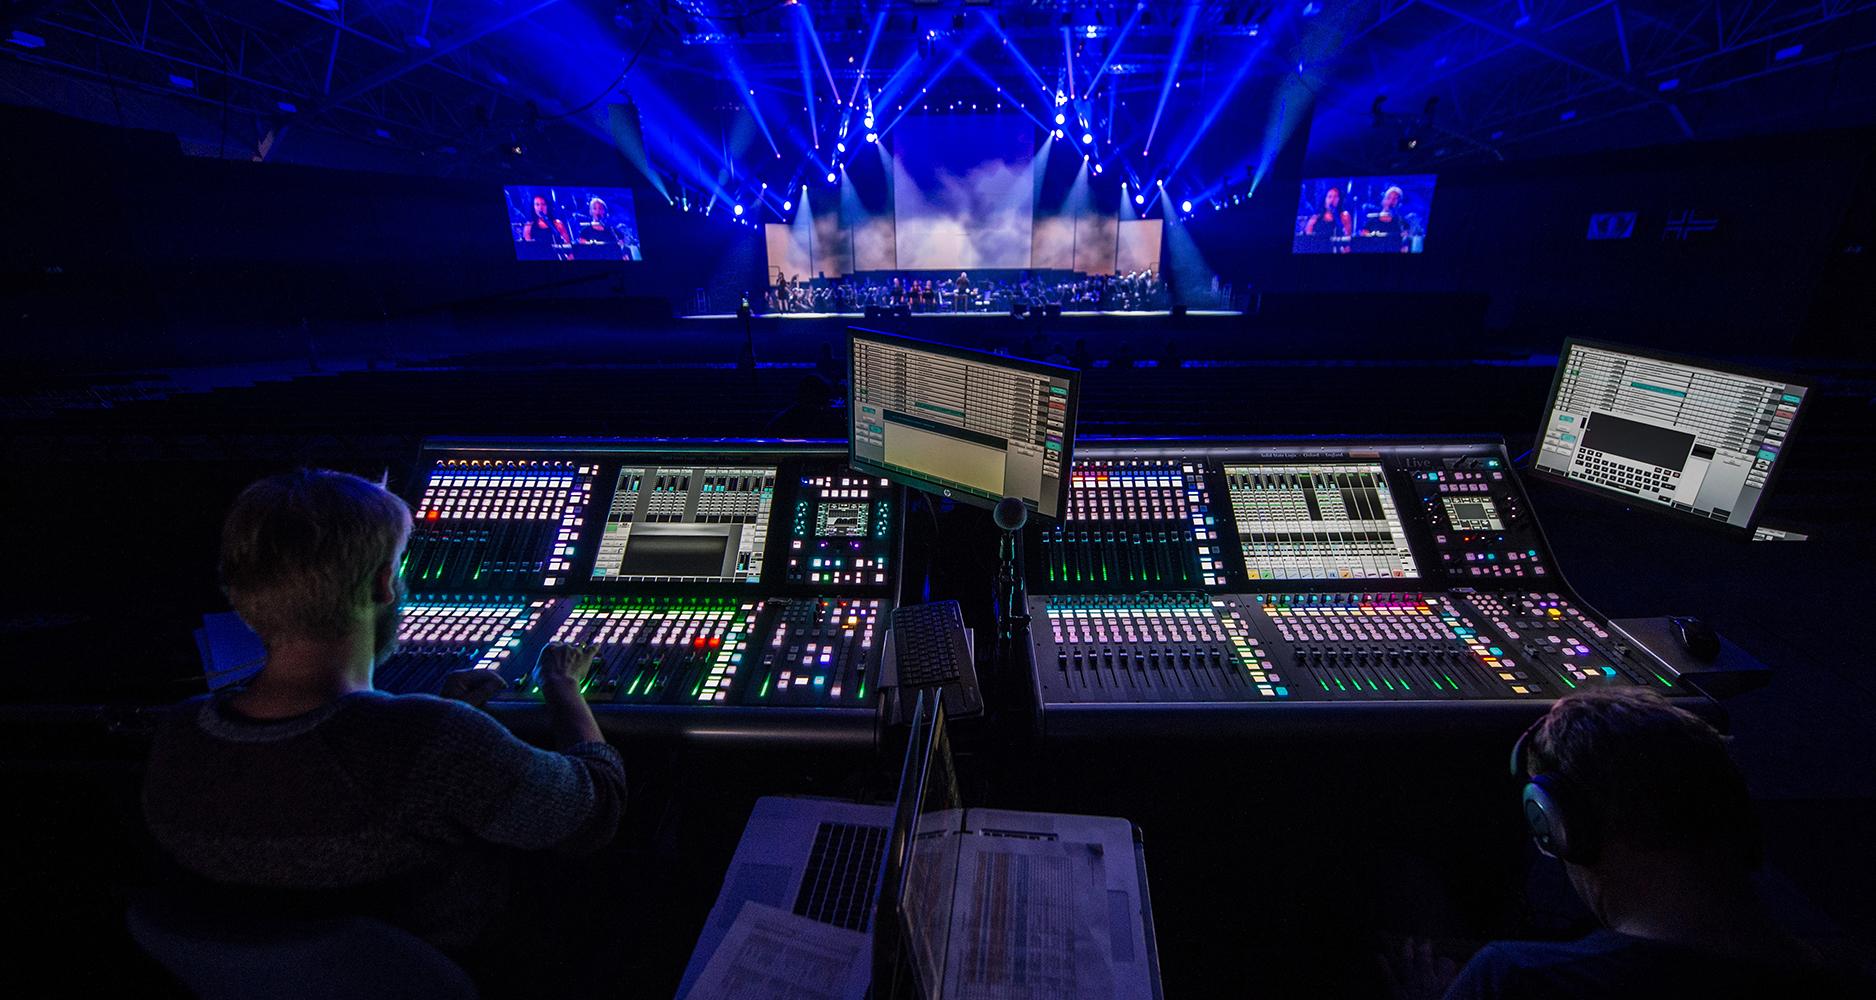 Diplomado Audio en vivo Academia Audioplace - Ingeniería de Sonido